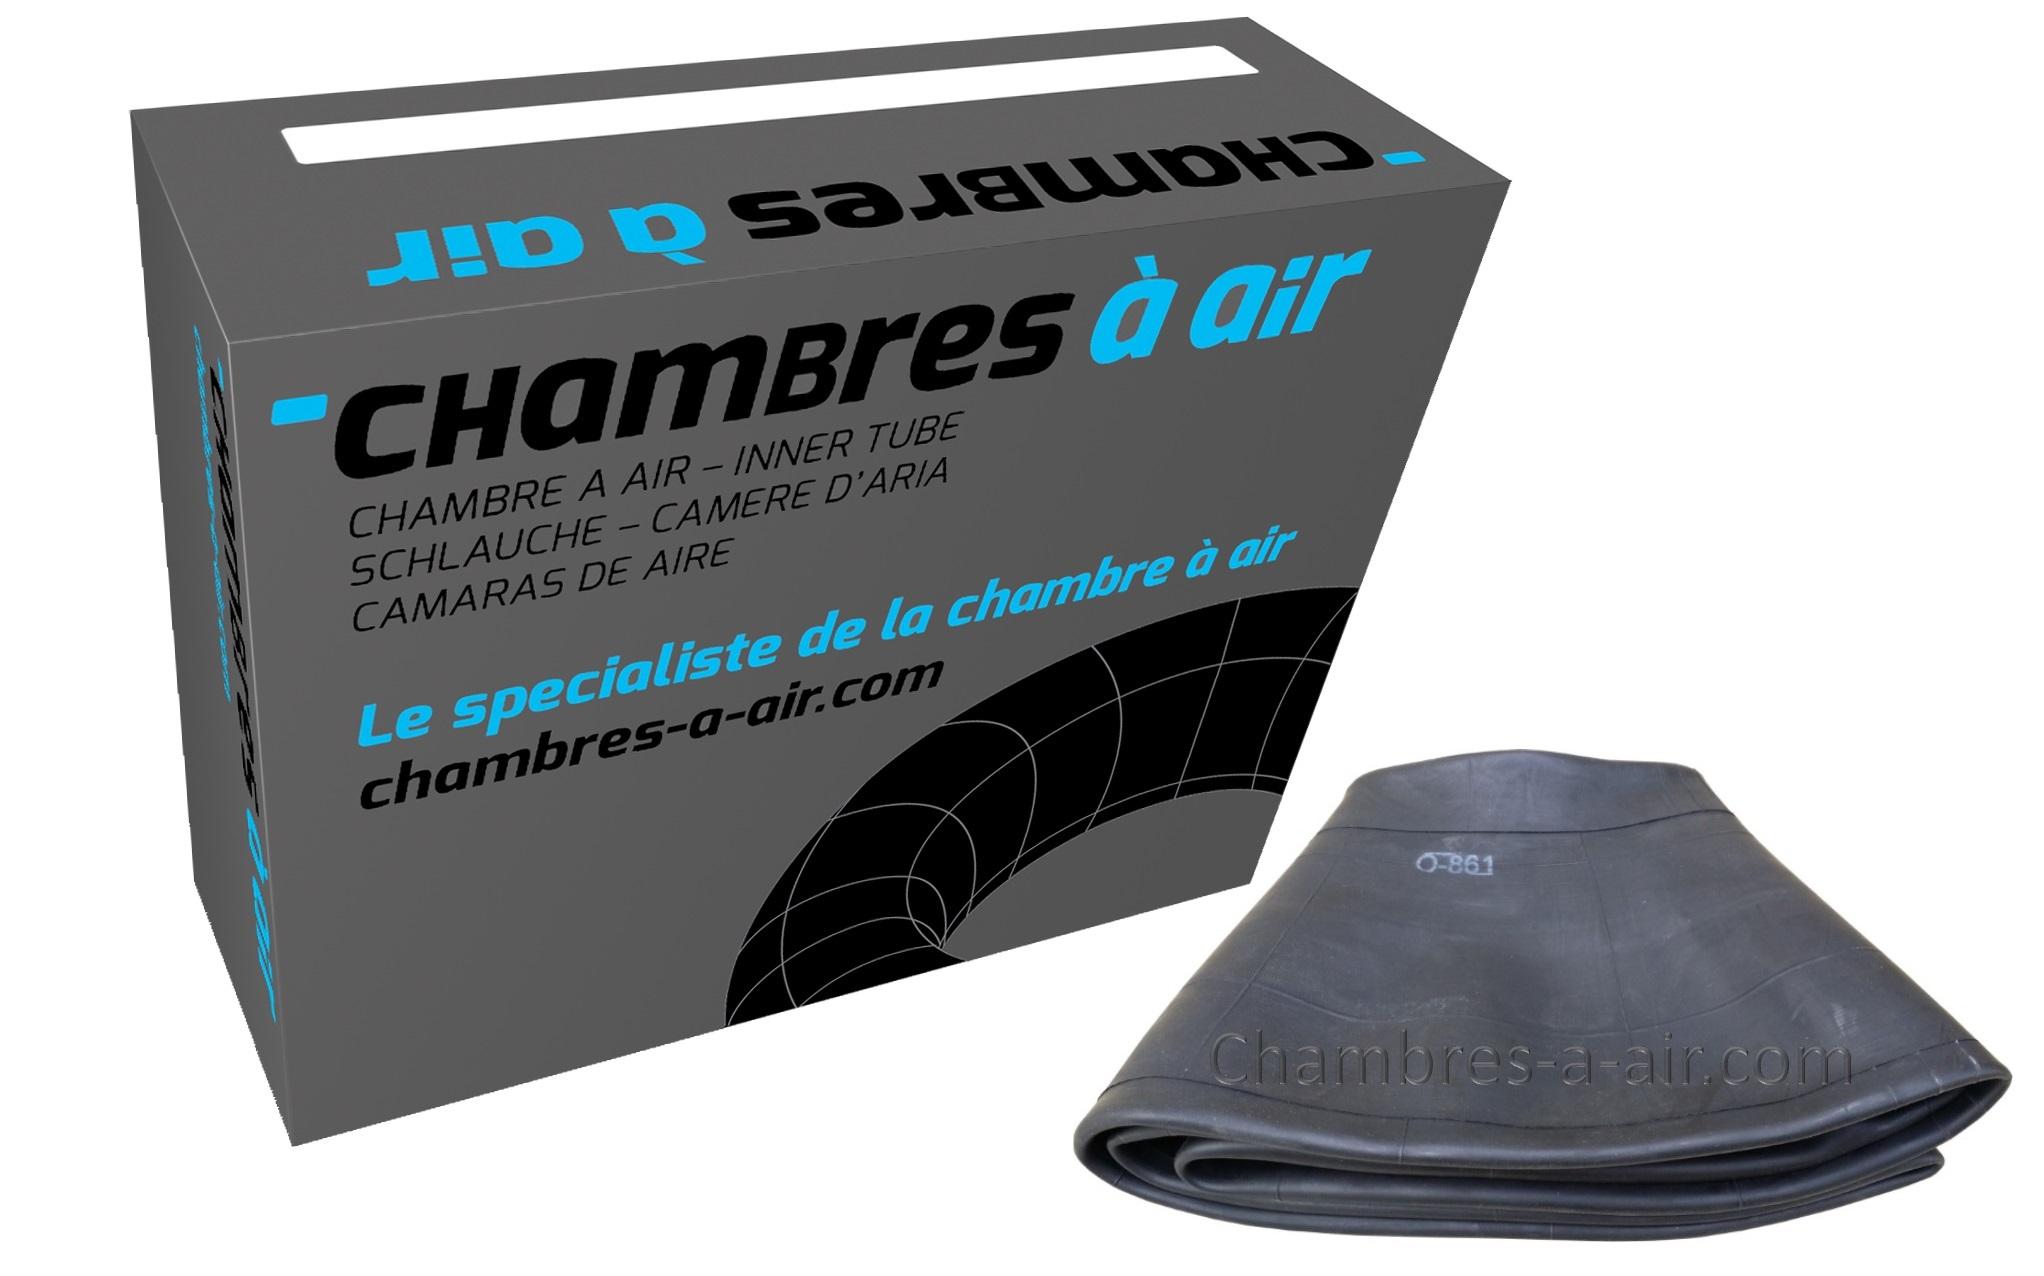 Chambre 195 205 16 valve tr13 c1619513 chambres a air for Chambre a air 5 20 13